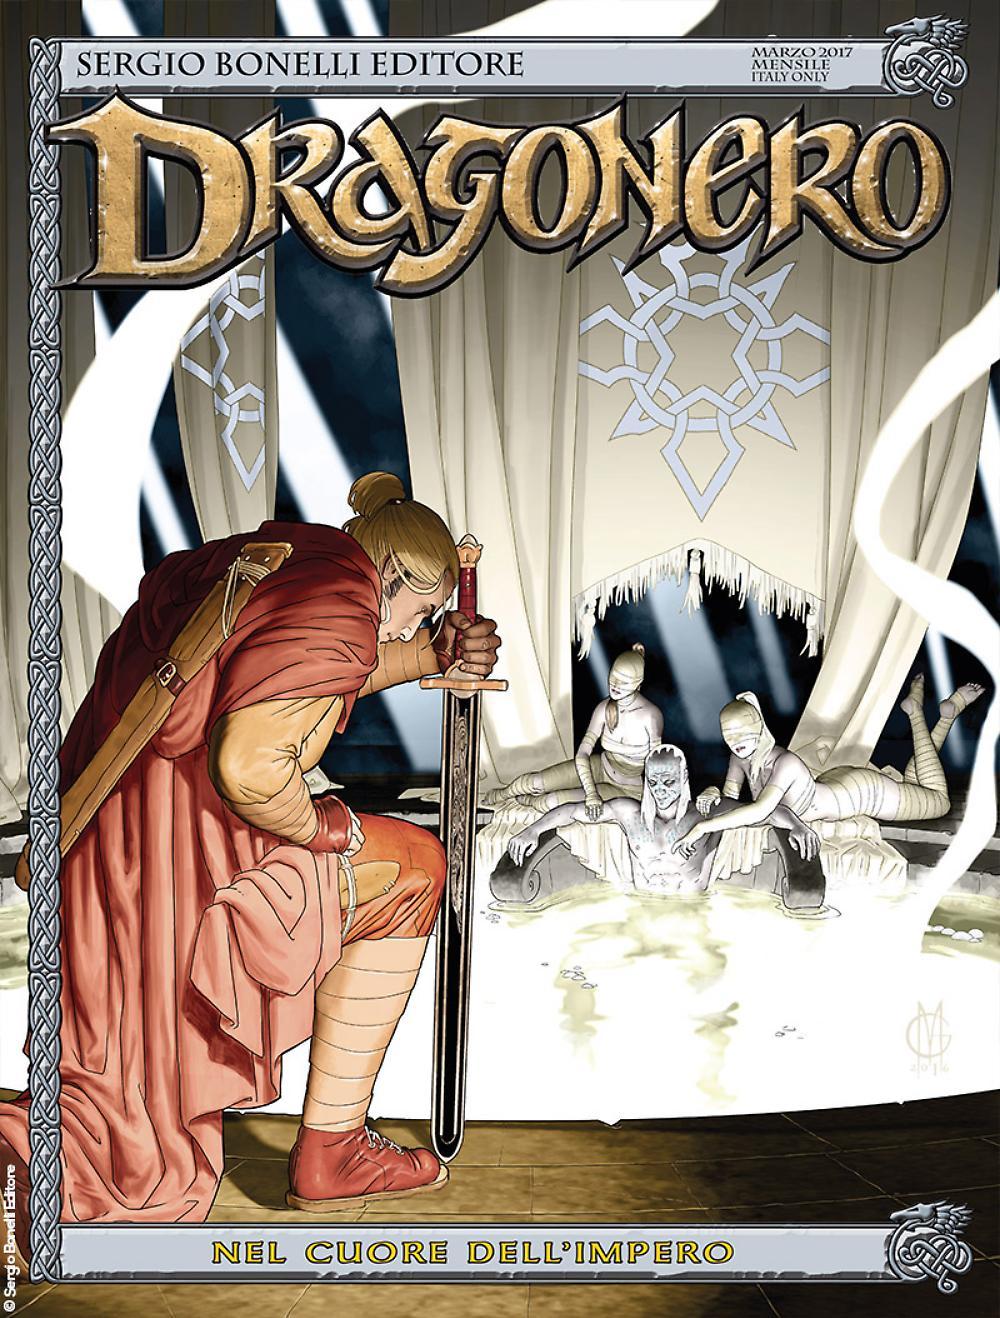 Dragonero #46